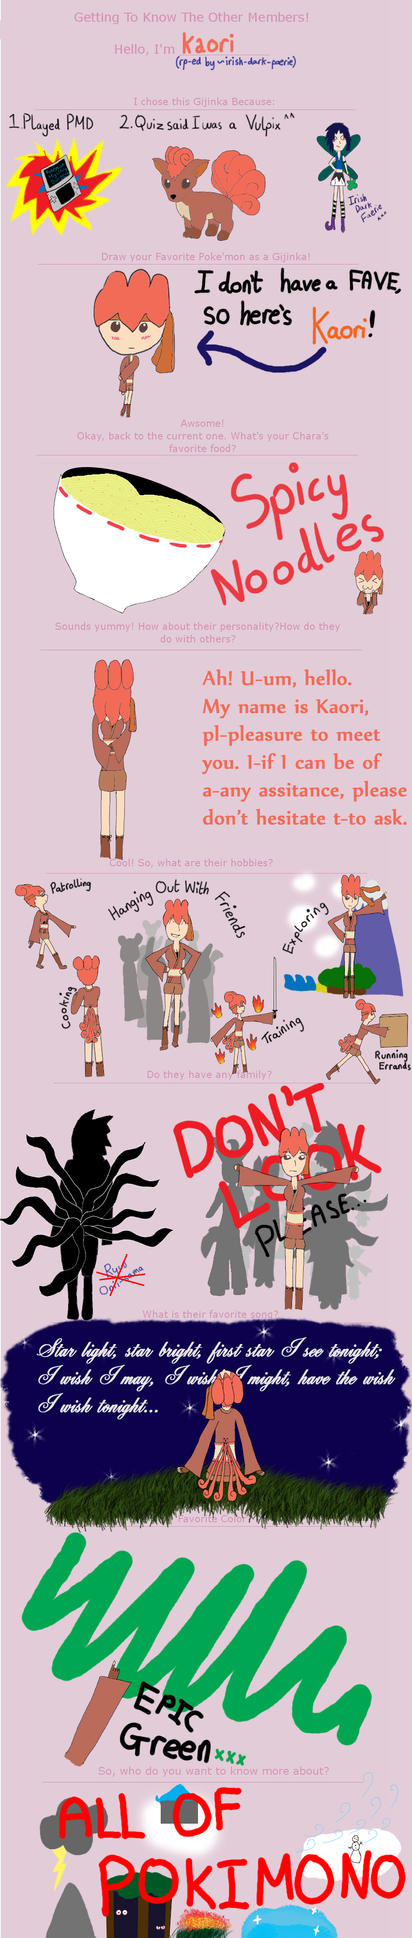 Kaori Meme by Irish-Dark-Faerie on DeviantArt